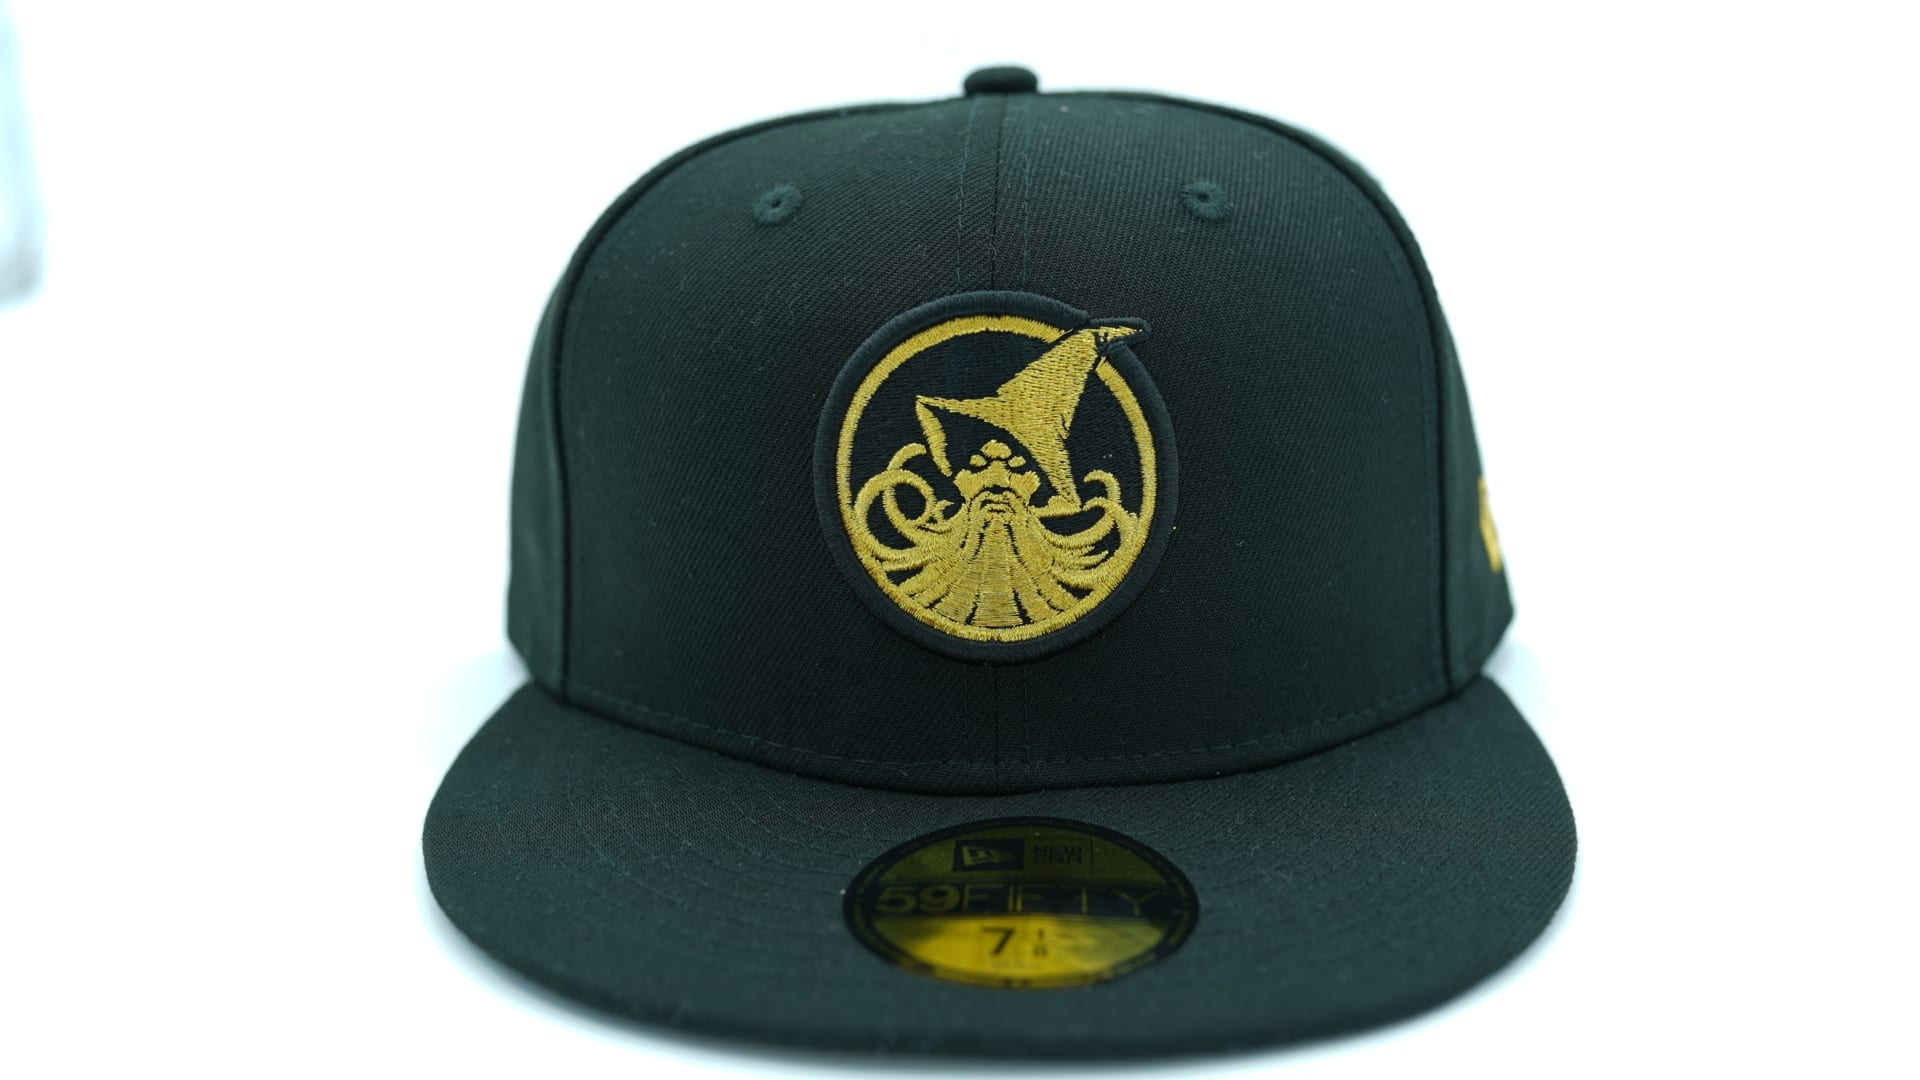 golden state warriors throwback fitted baseball cap reebok crossfit hat black hockey